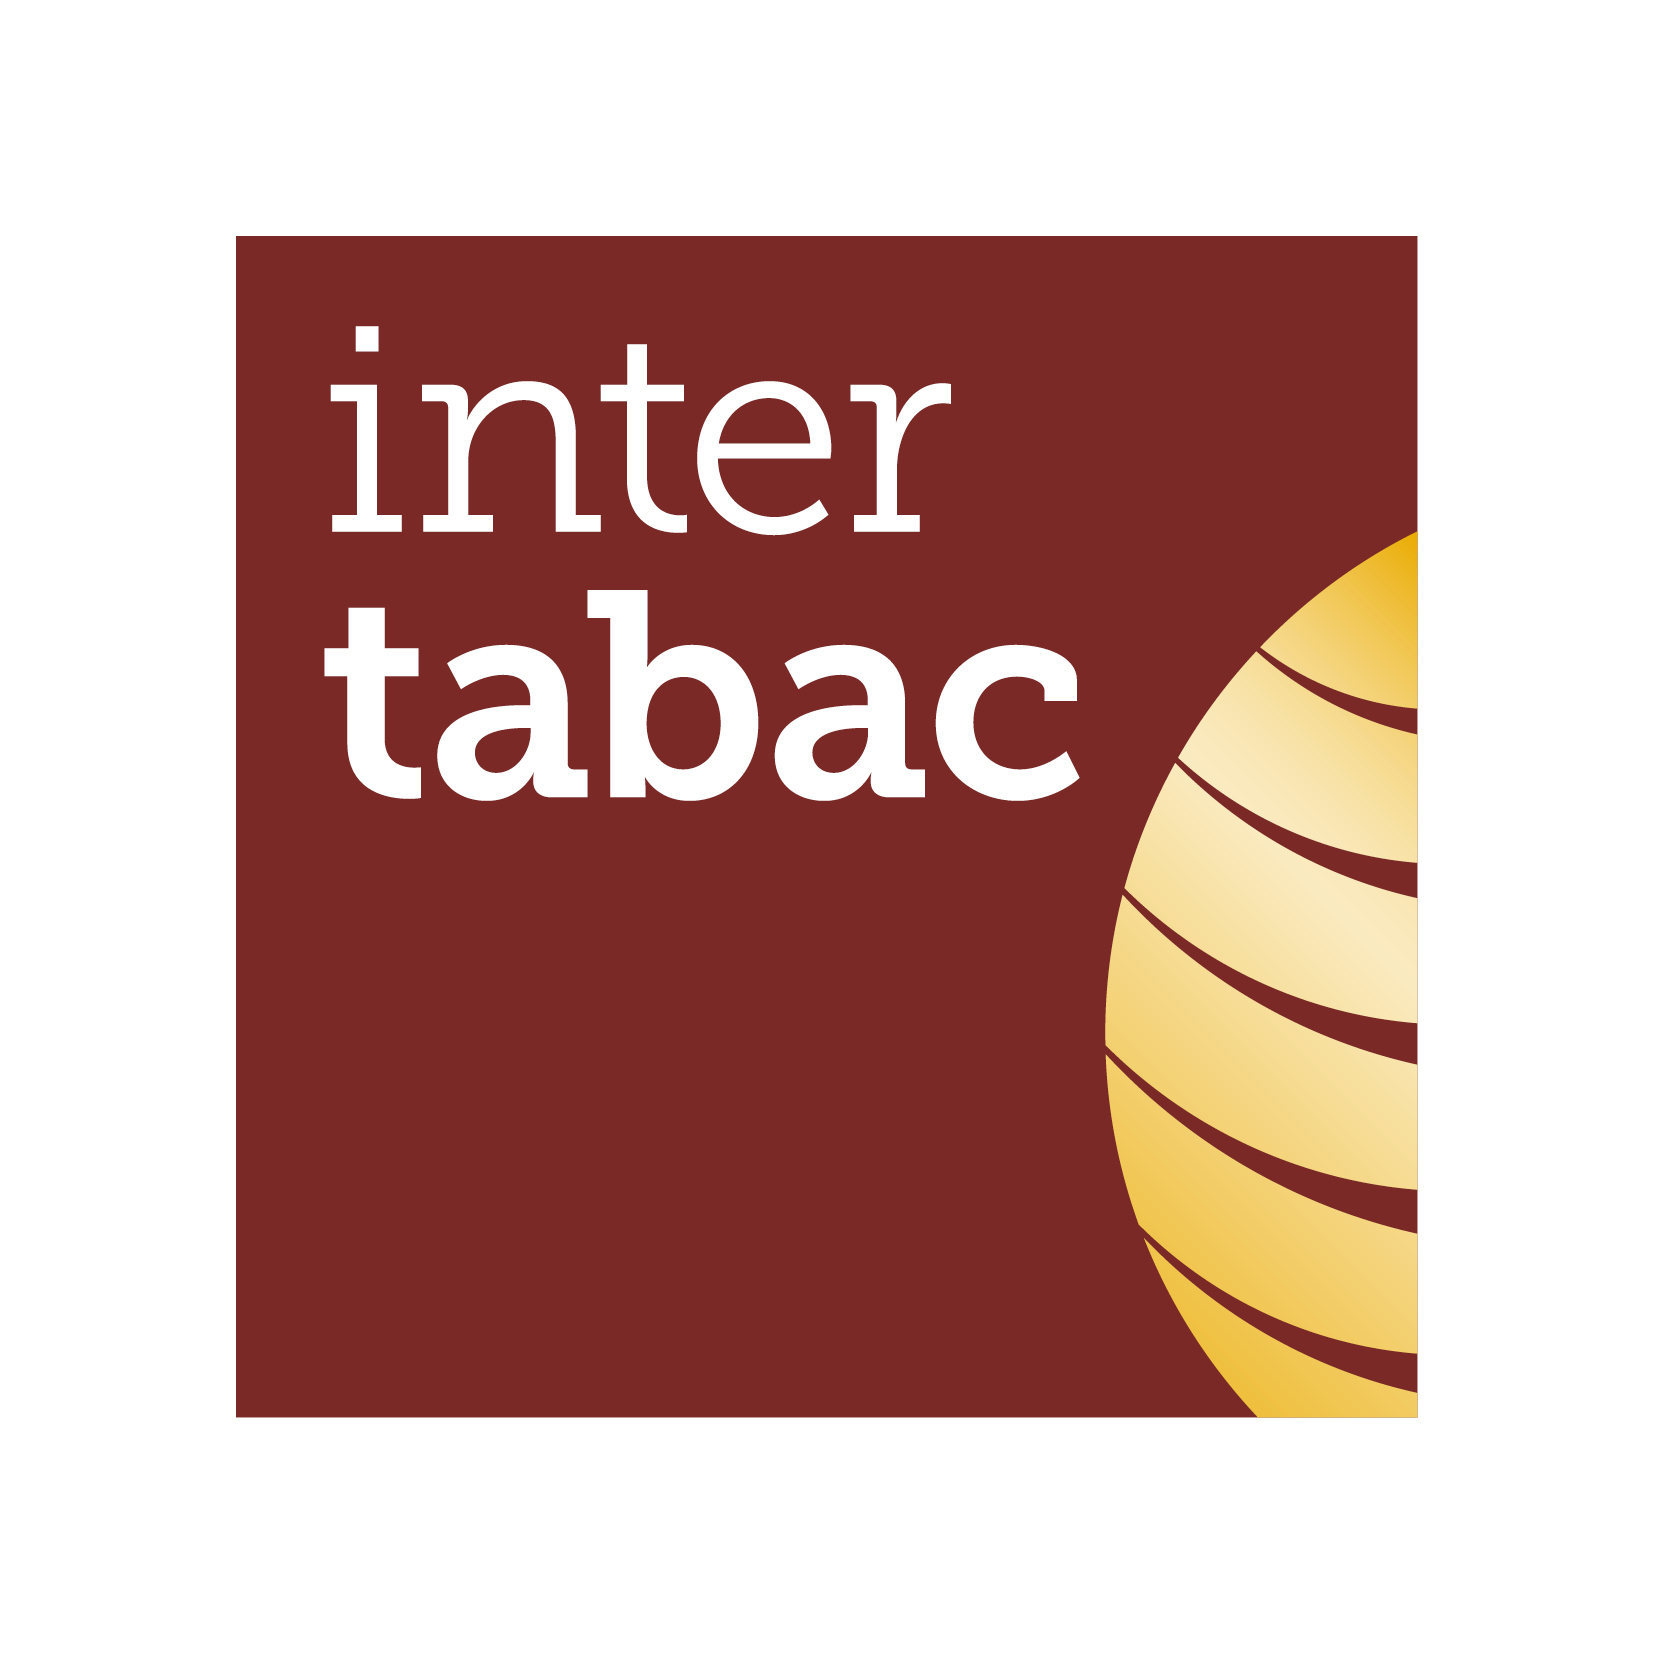 INTER TABAC 2019